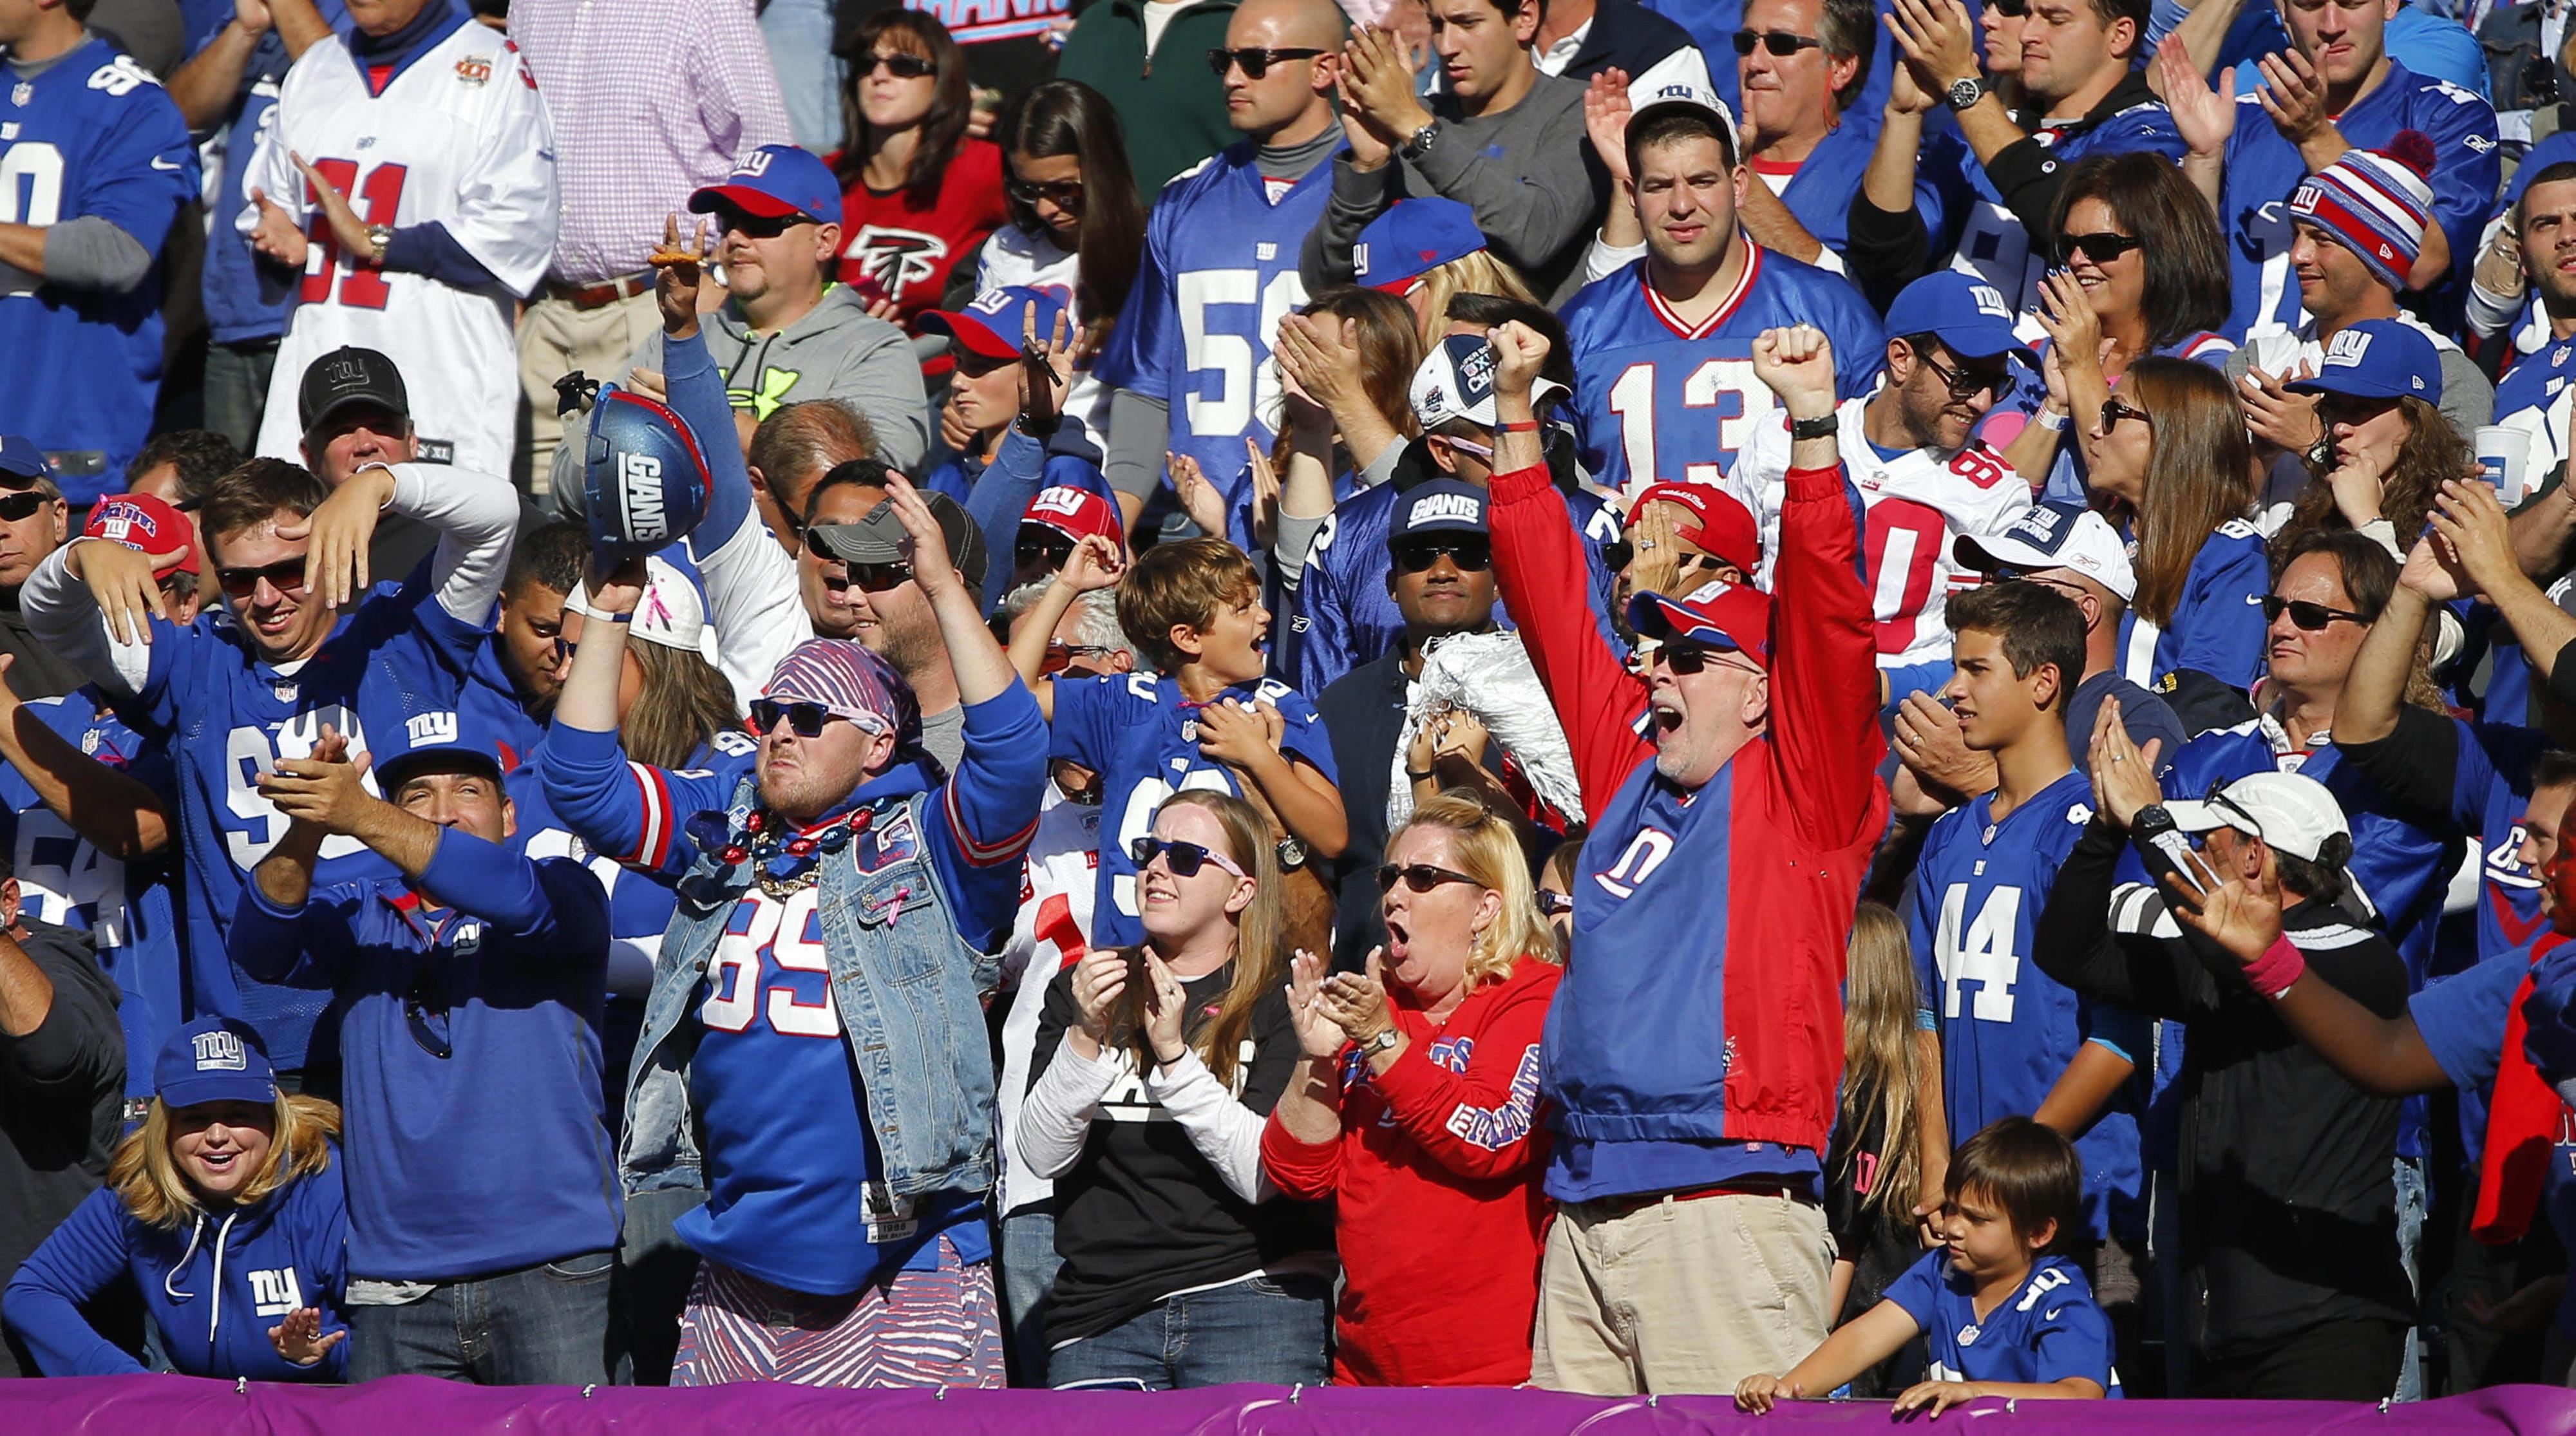 Giants fans celebrate Sunday at MetLife Stadium